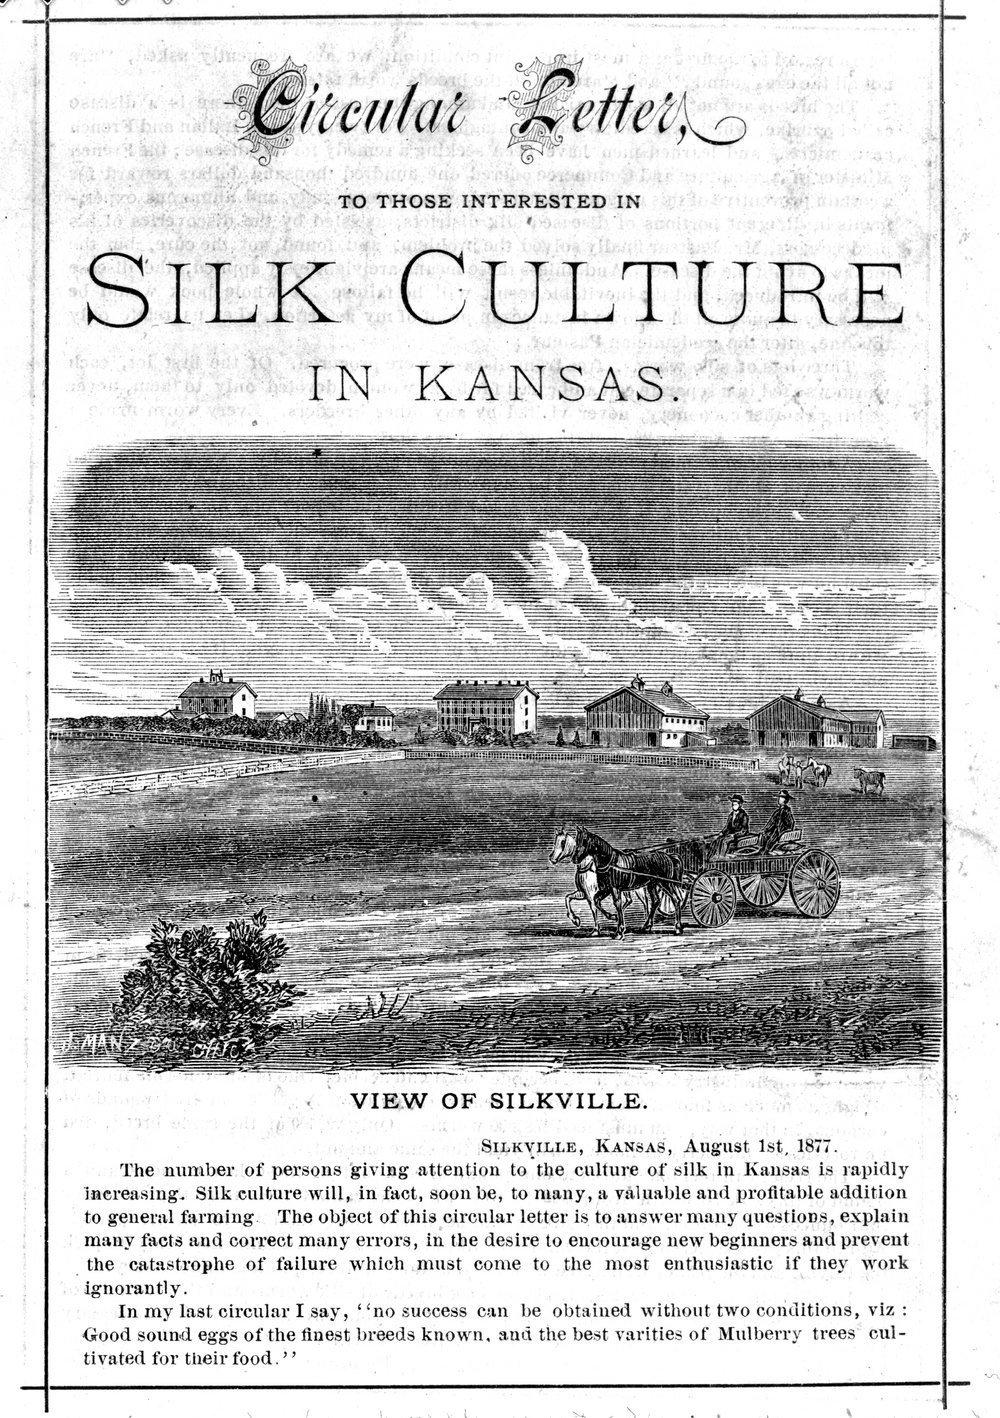 Circular letter regarding Silkville, Kansas